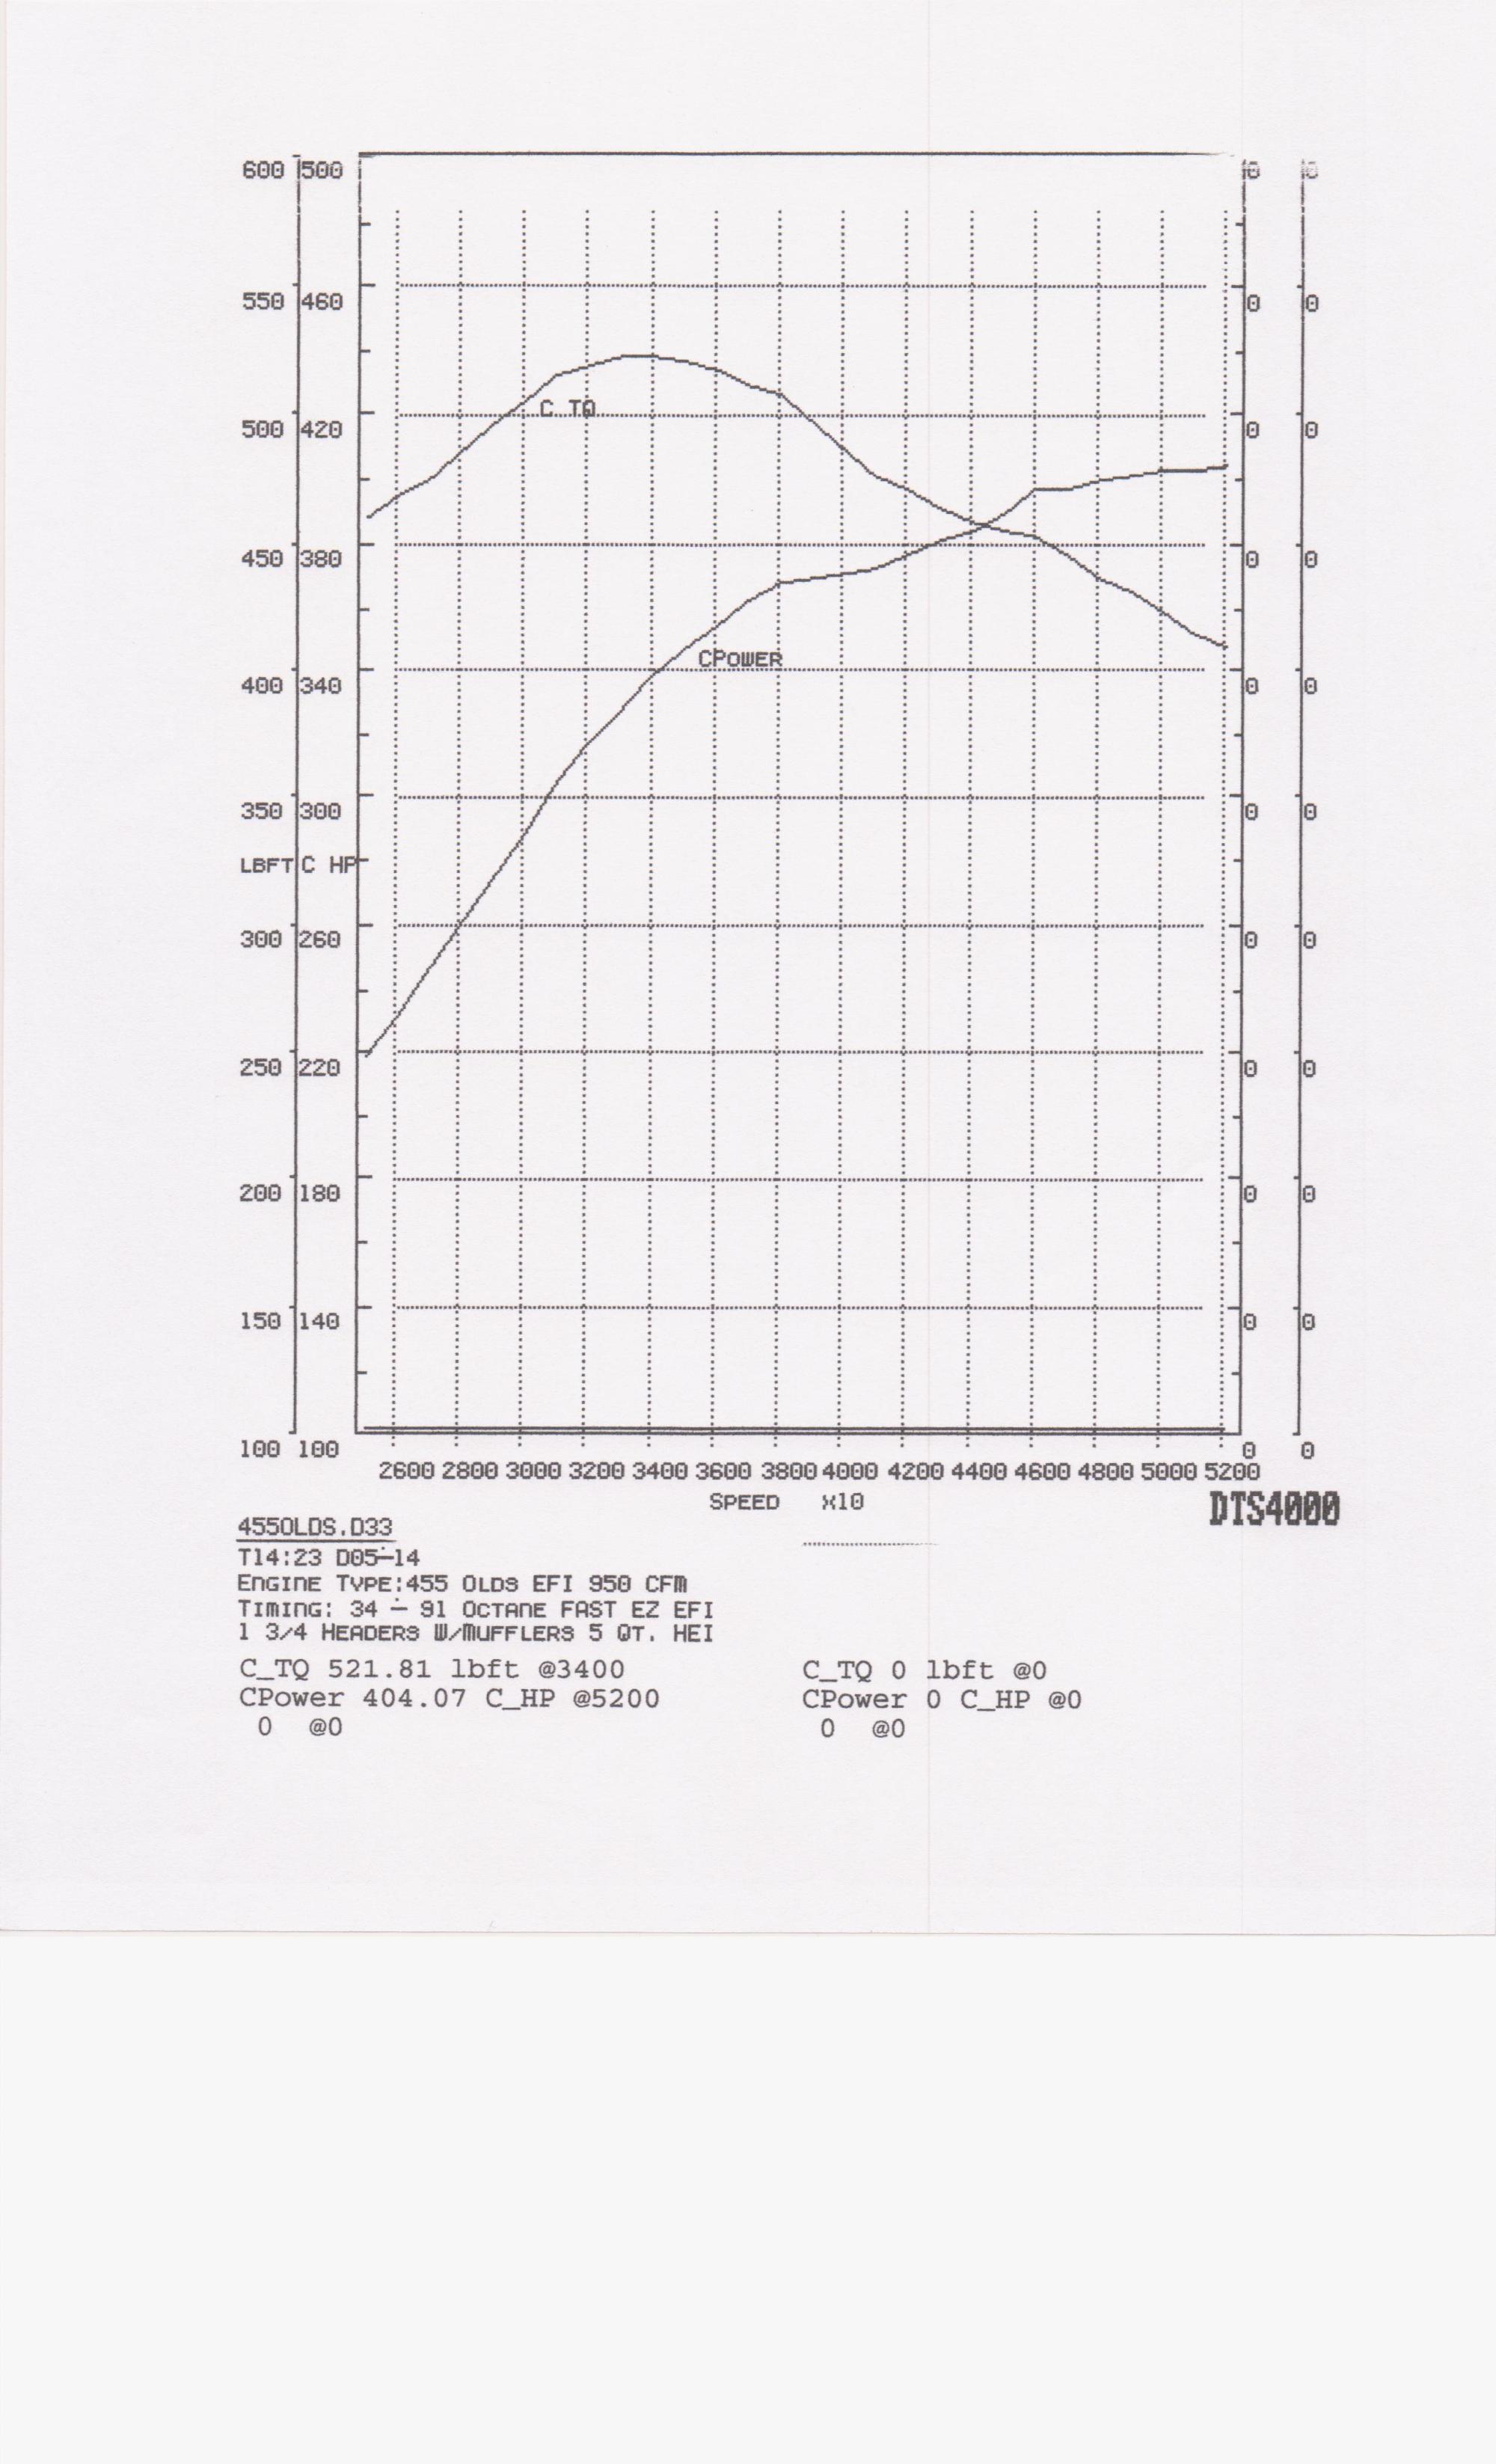 hight resolution of oldsmobile 350 engine diagram enwoi rep mannheim de u2022wrg 9367 oldsmobile 350 engine diagram rh